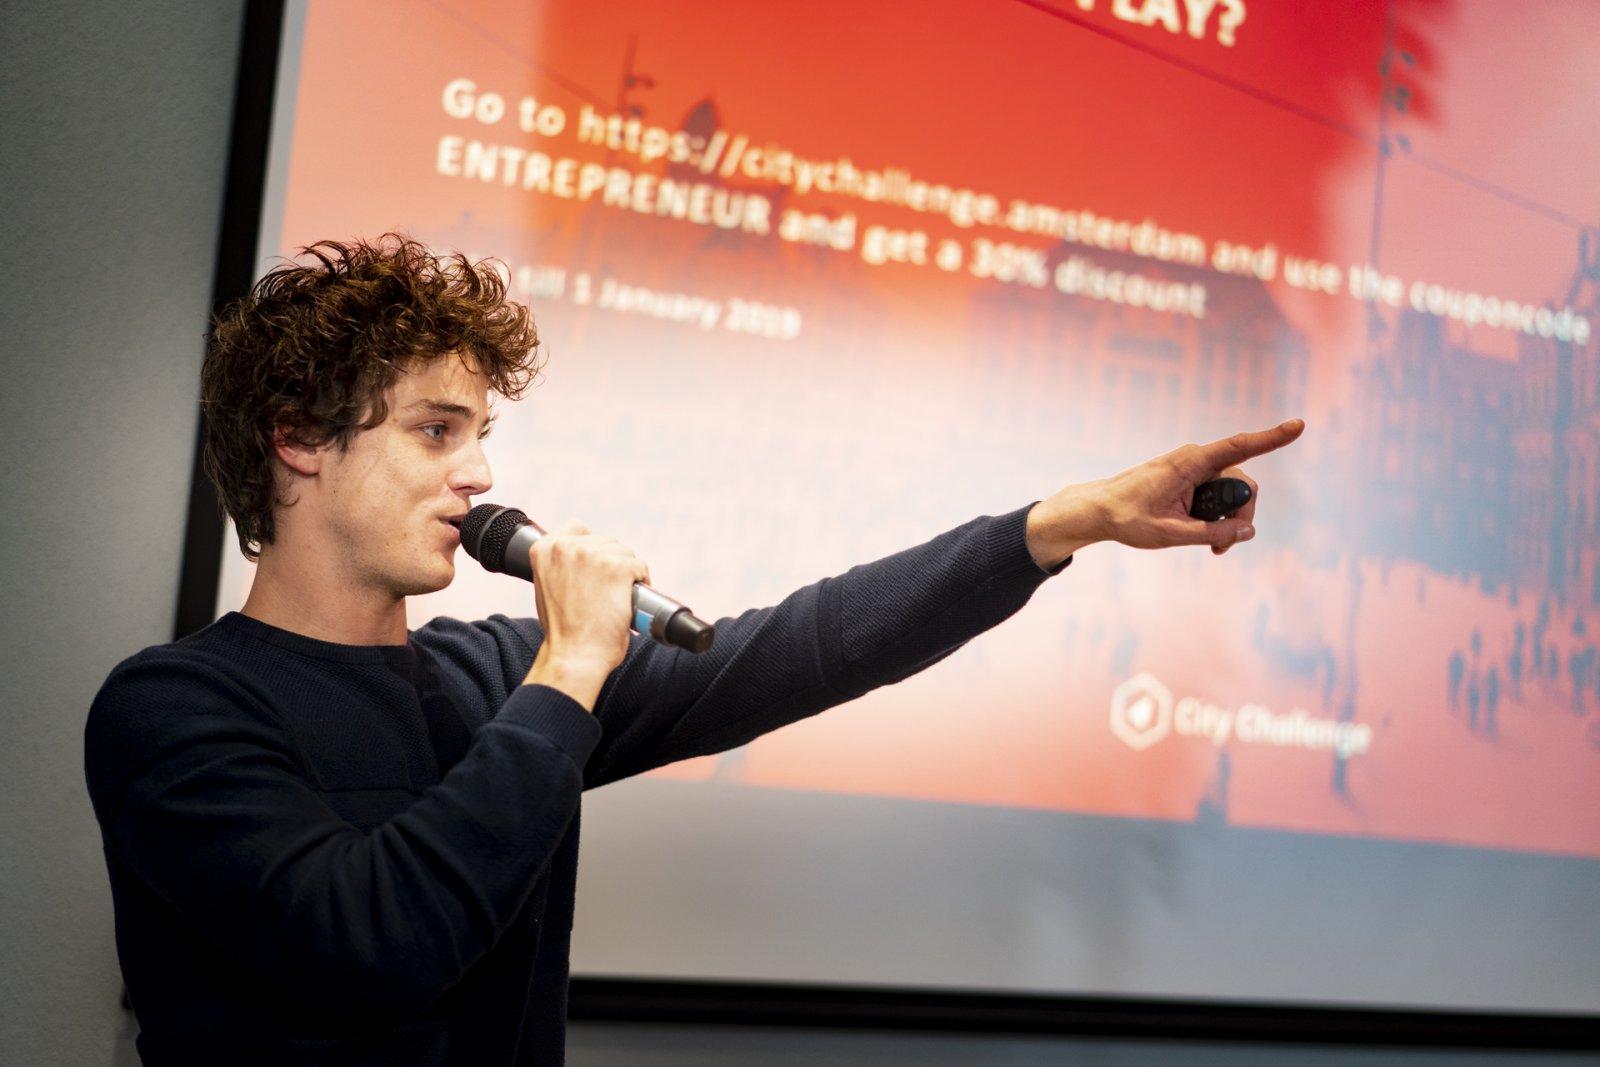 Luuk Koedam on being a student entrepreneur